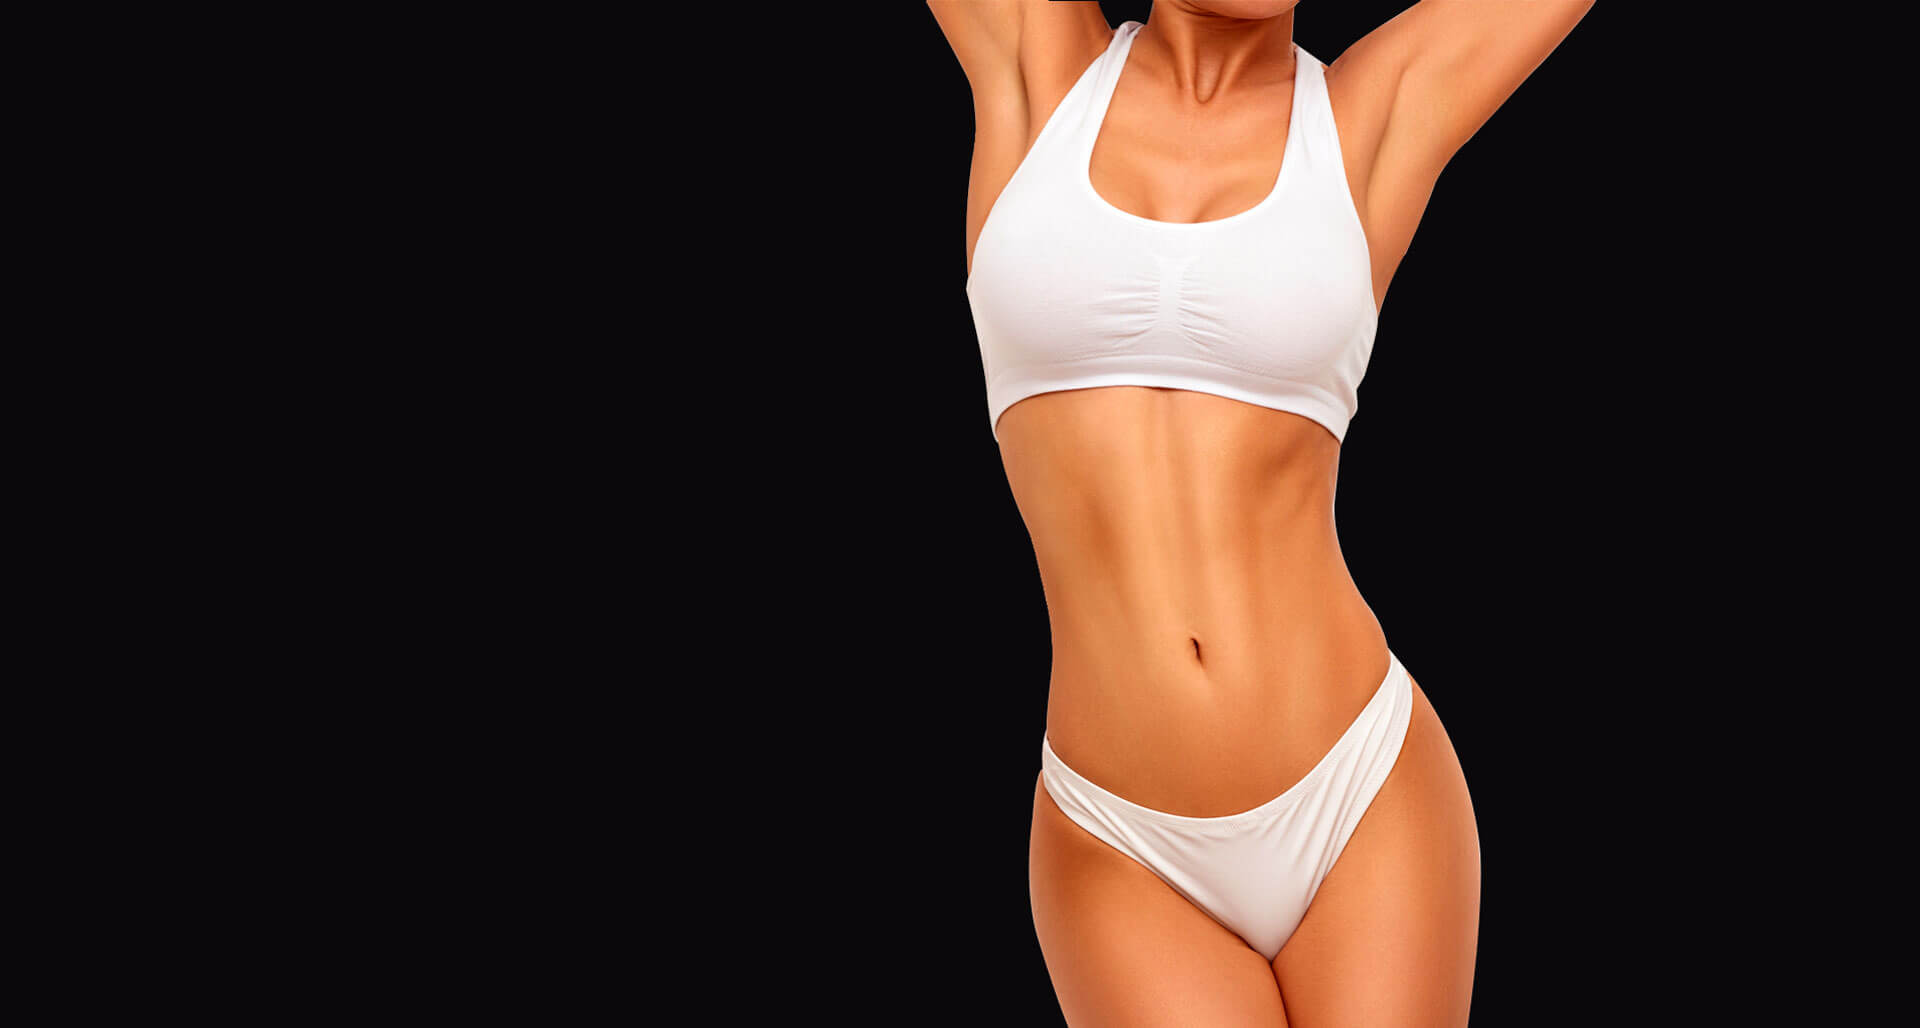 Women's Body Surgery